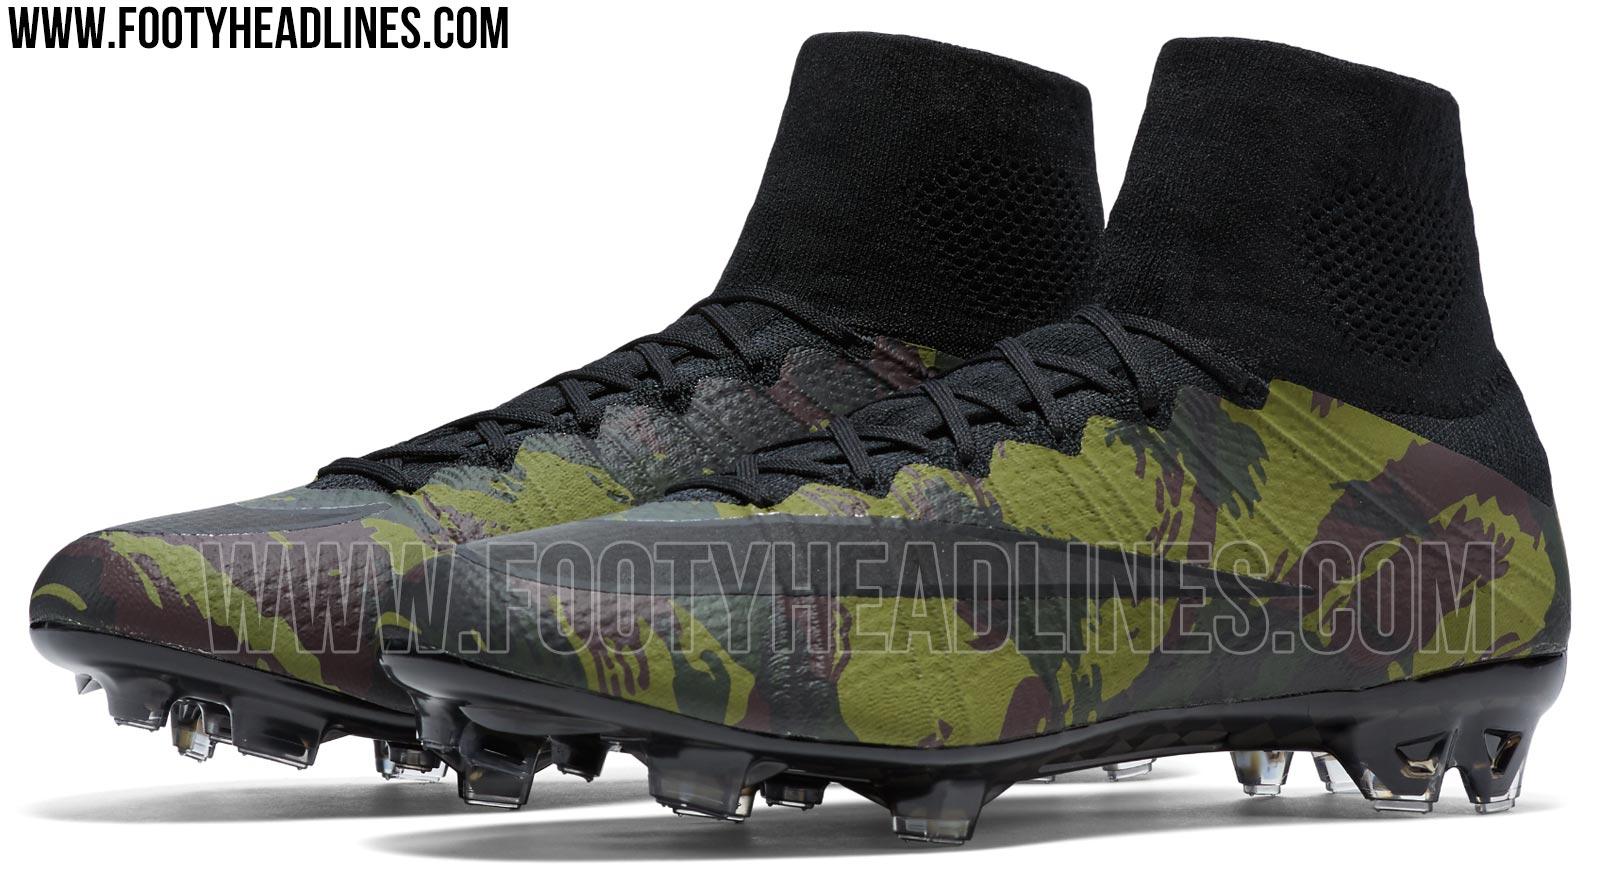 fa1eeeec09c10 The new Nike Mercurial Superfly Camo football boots introduce a bold  stealth look for the Nike Mercurial, set to be available to buy from  tomorrow, April 7, ...